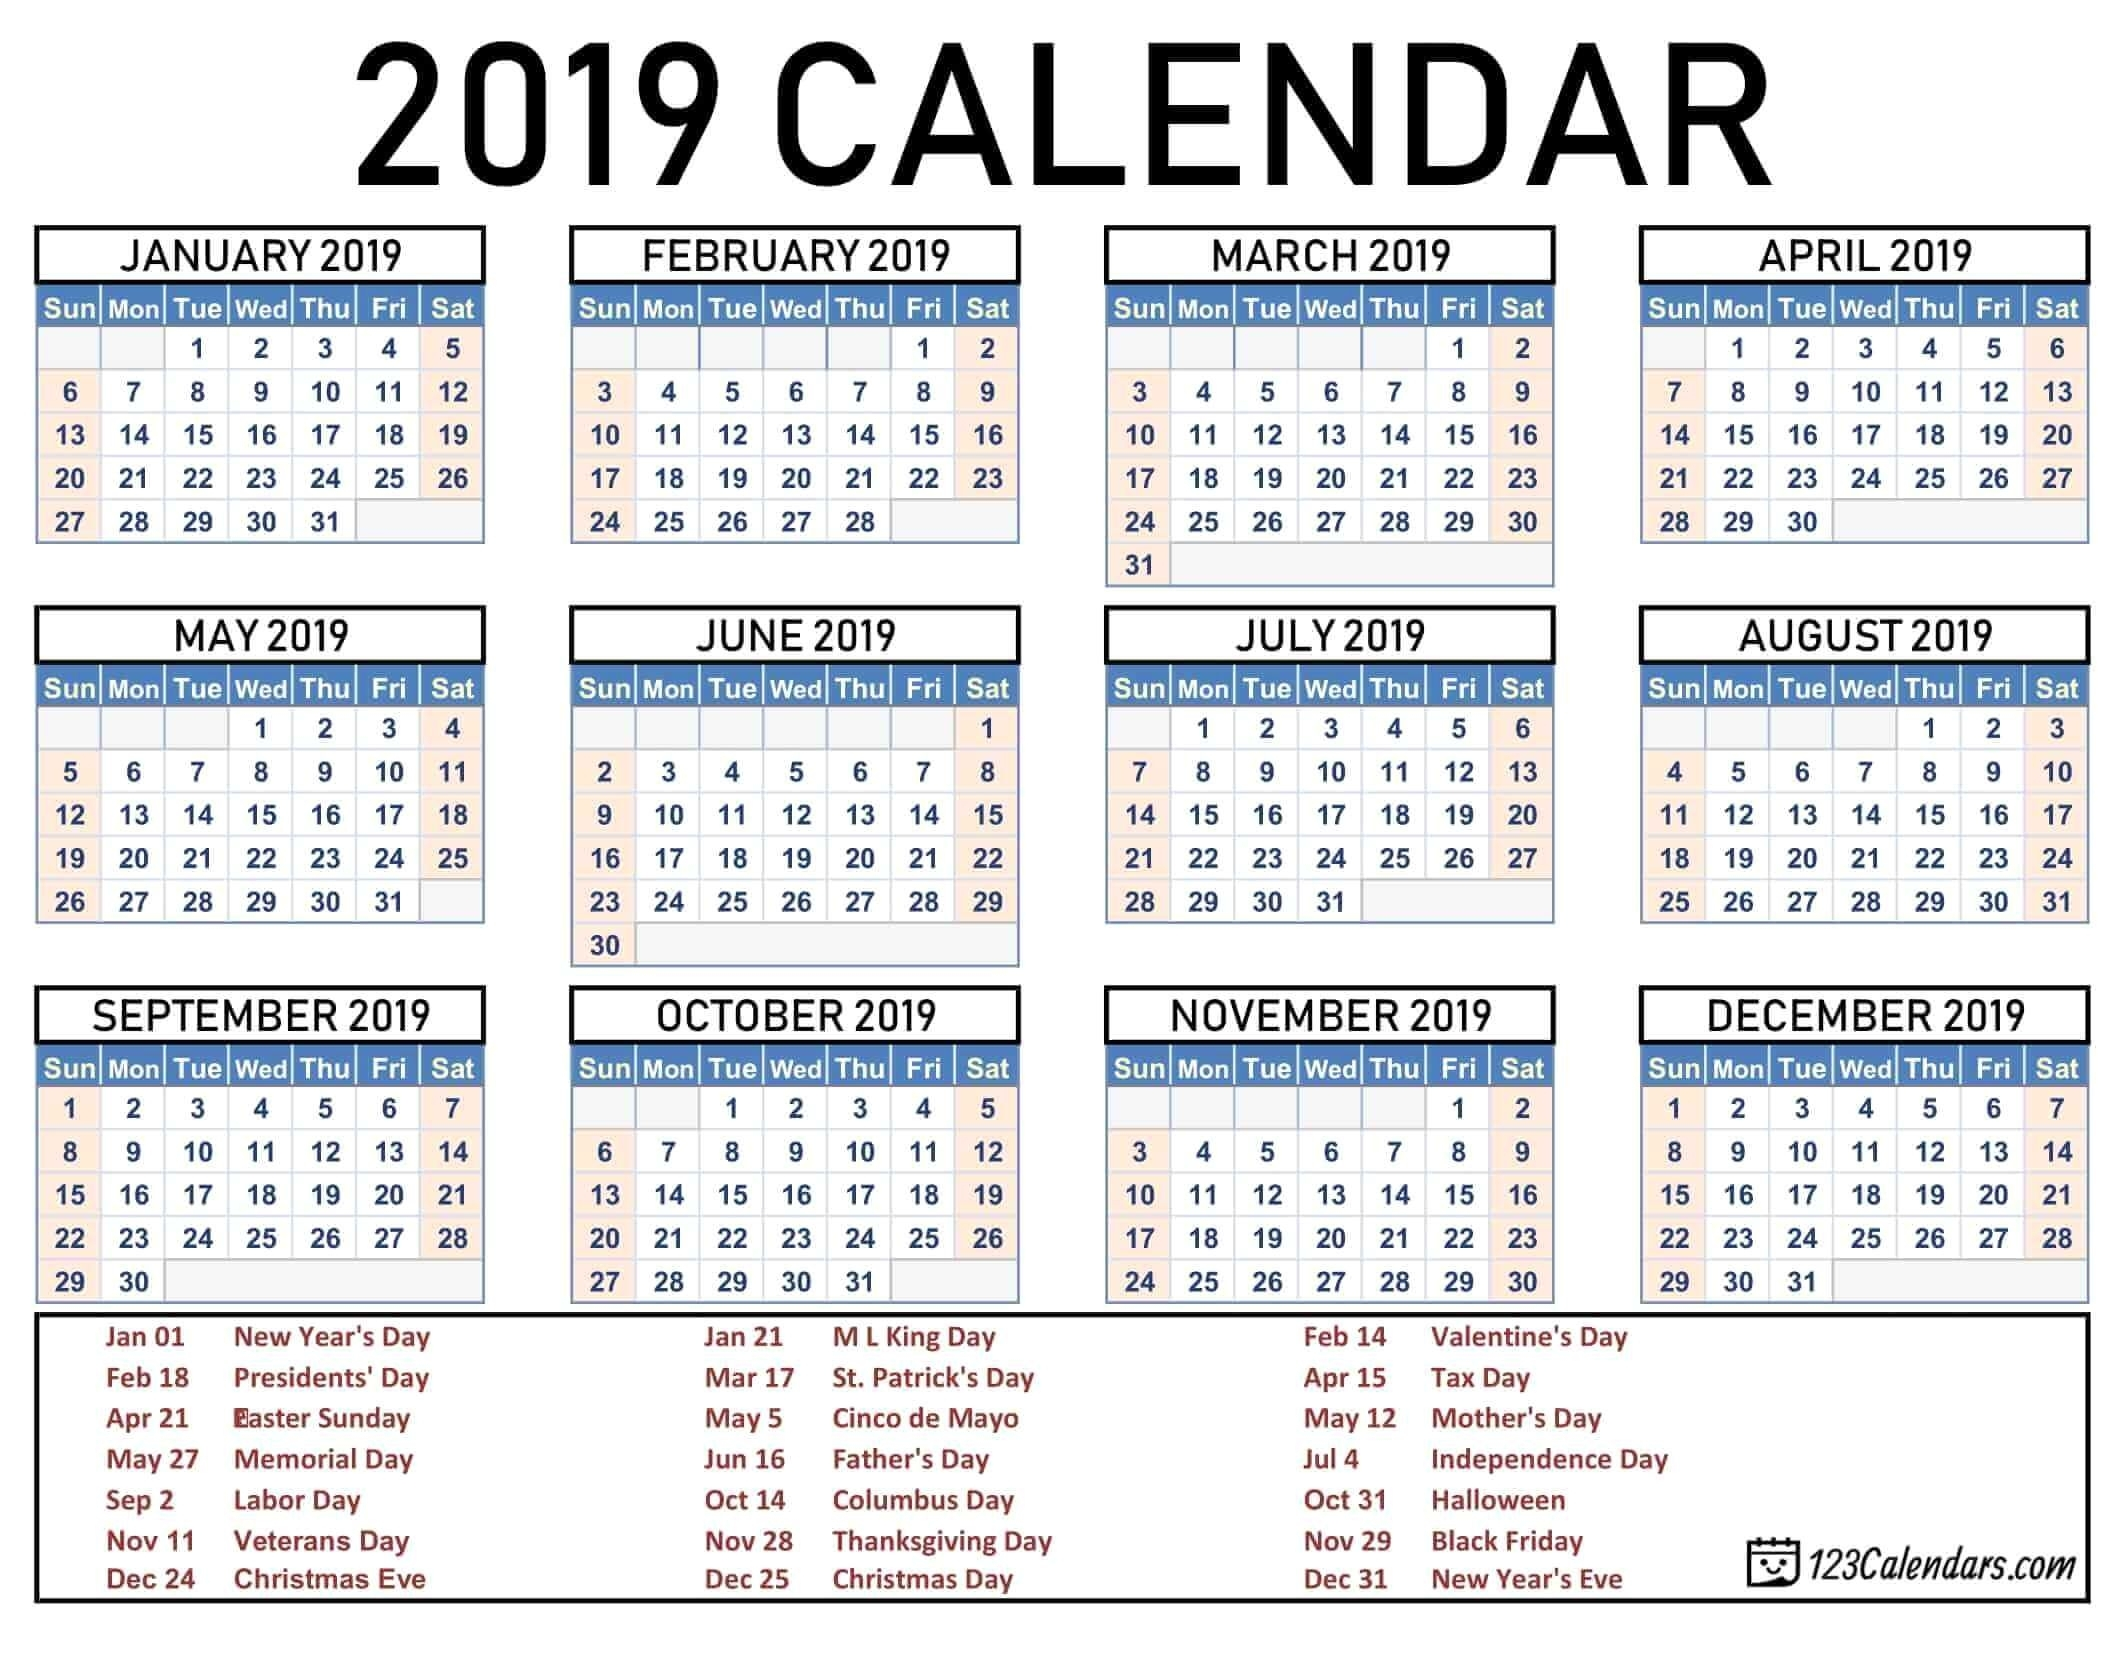 2019 2020 School Year Calendar Template Year 2019 Printable